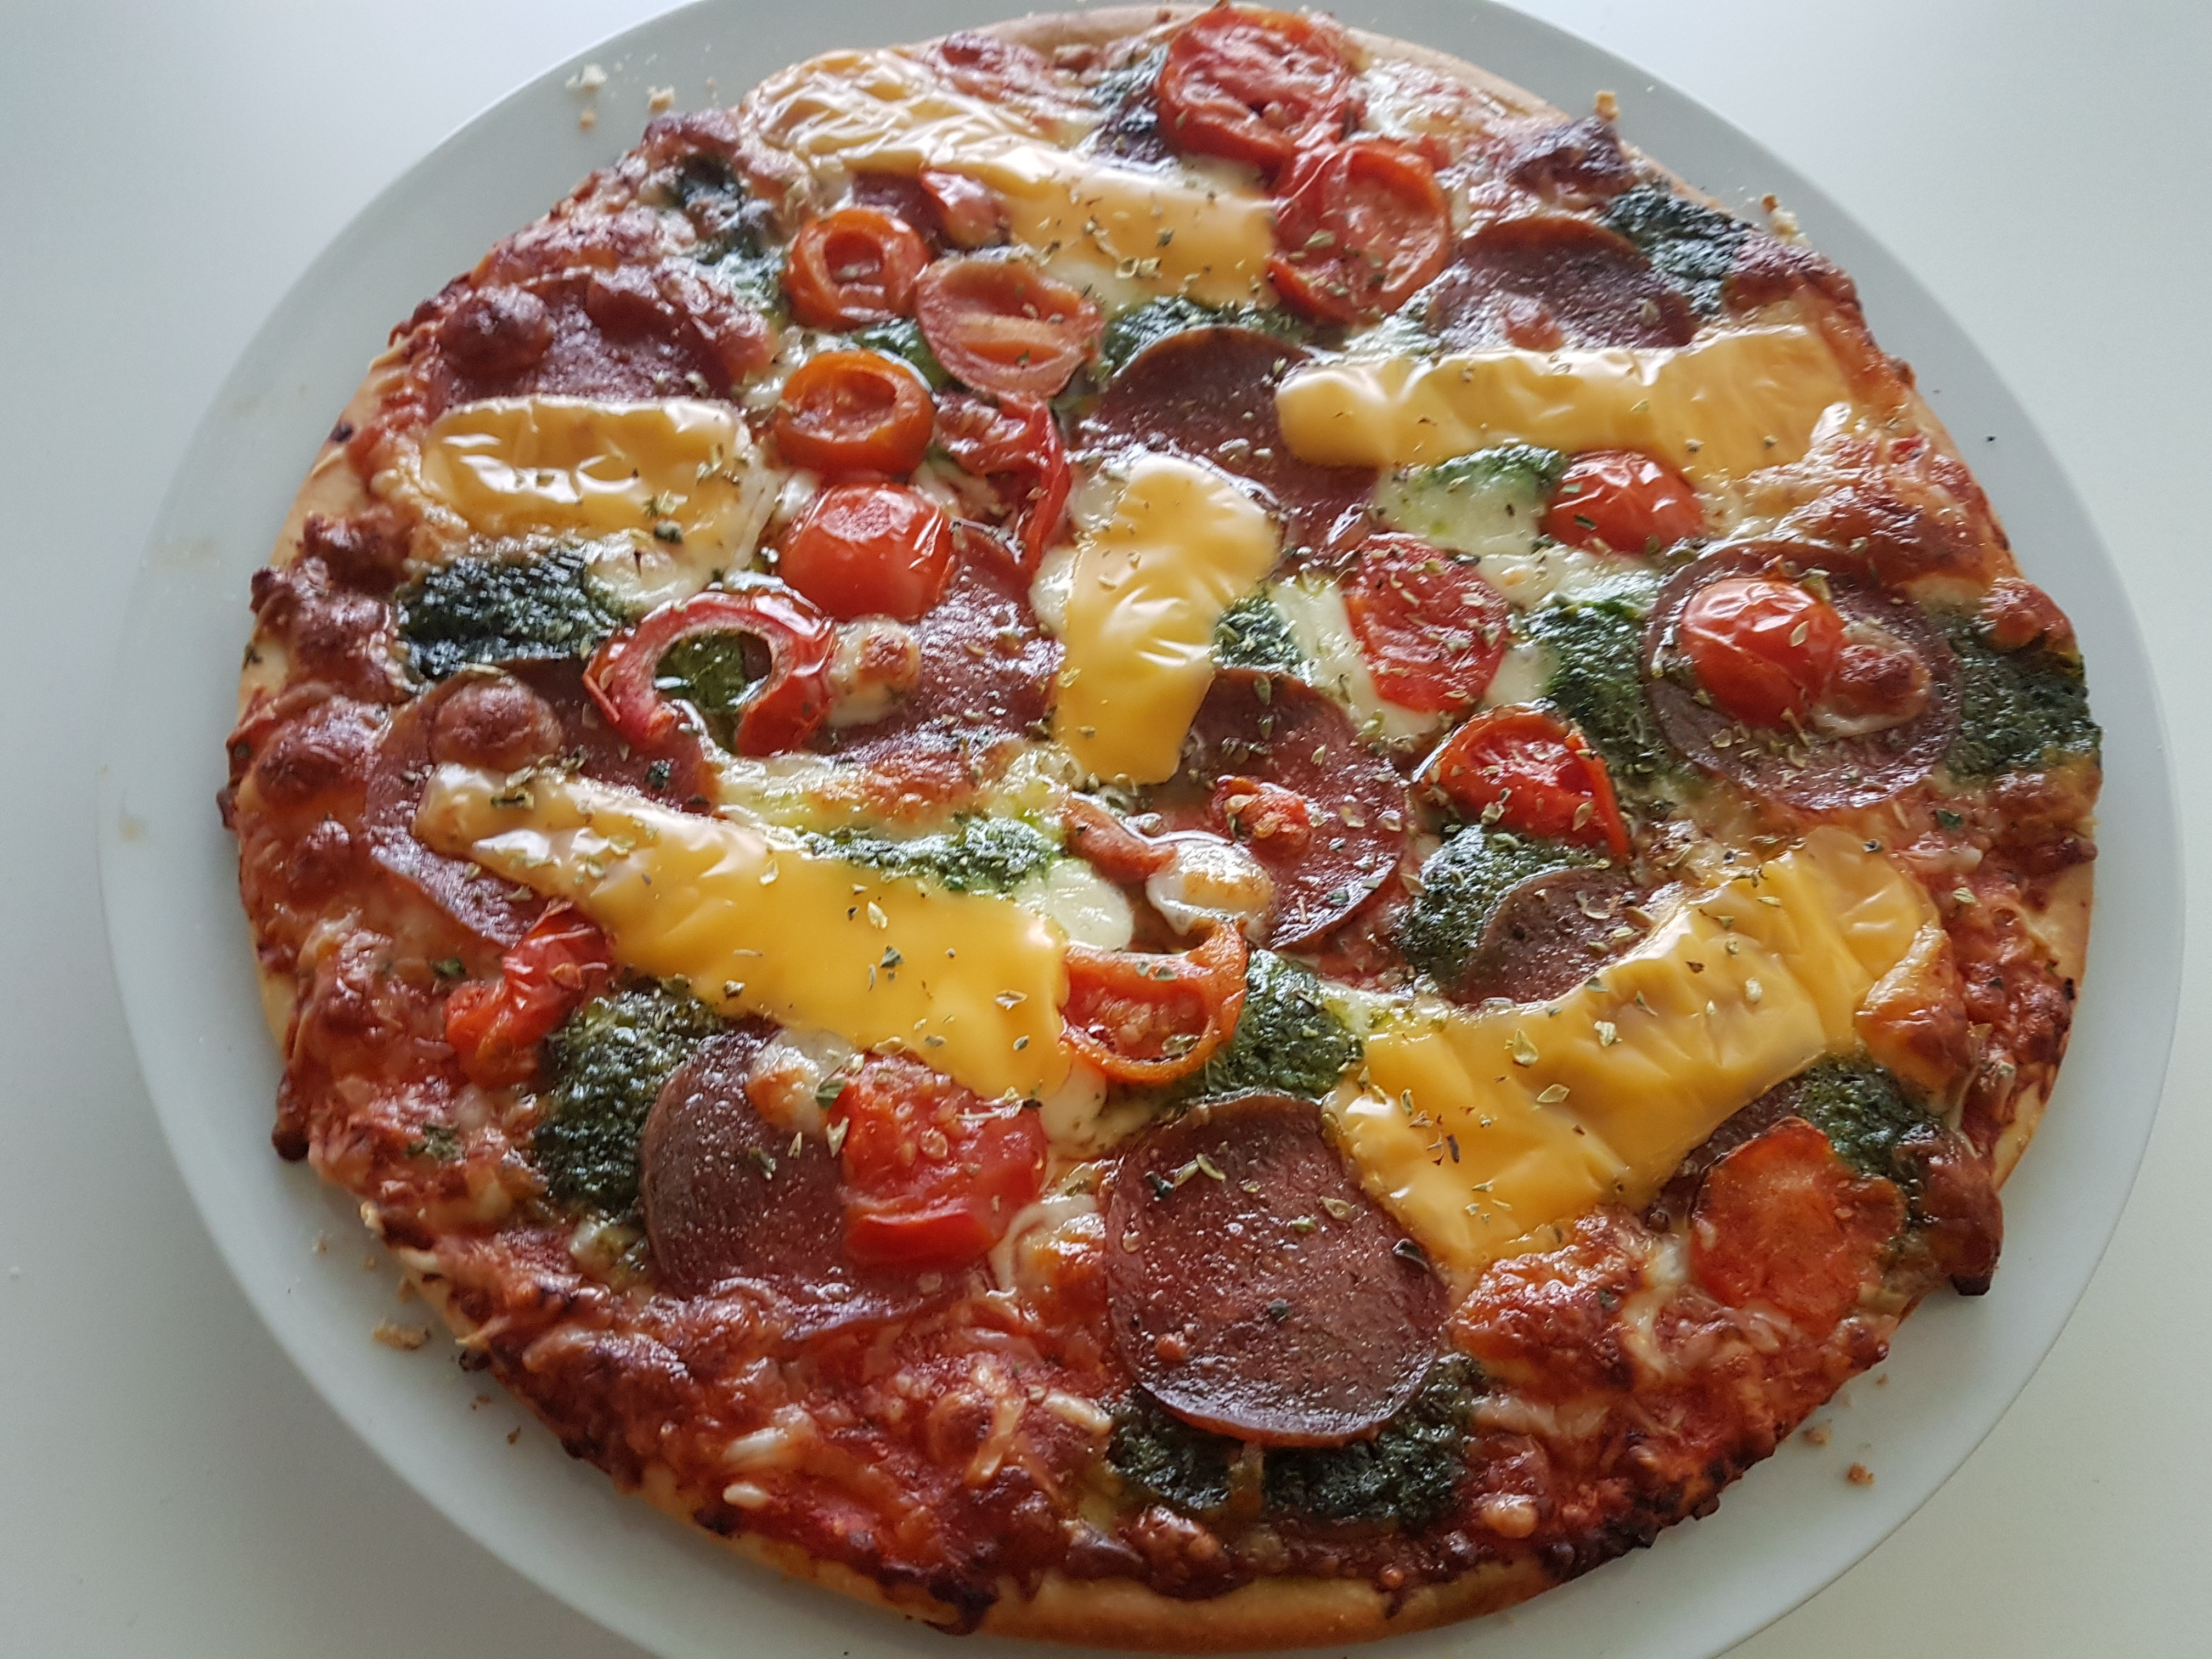 http://foodloader.net/Holz_2017-08-26_Pizza.jpg